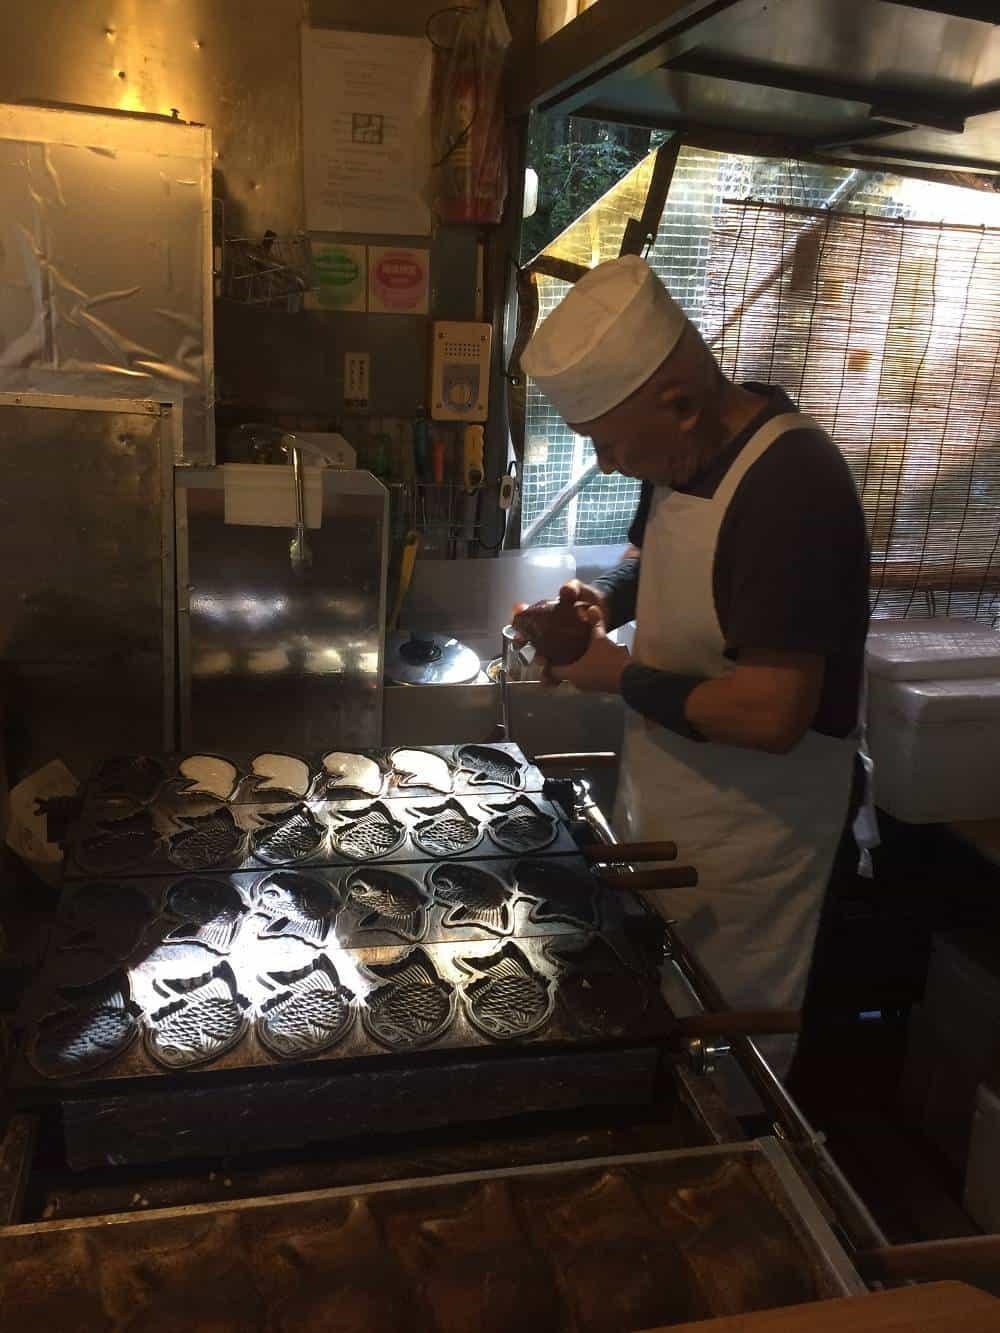 Making Taiyaki in Nikko Japan